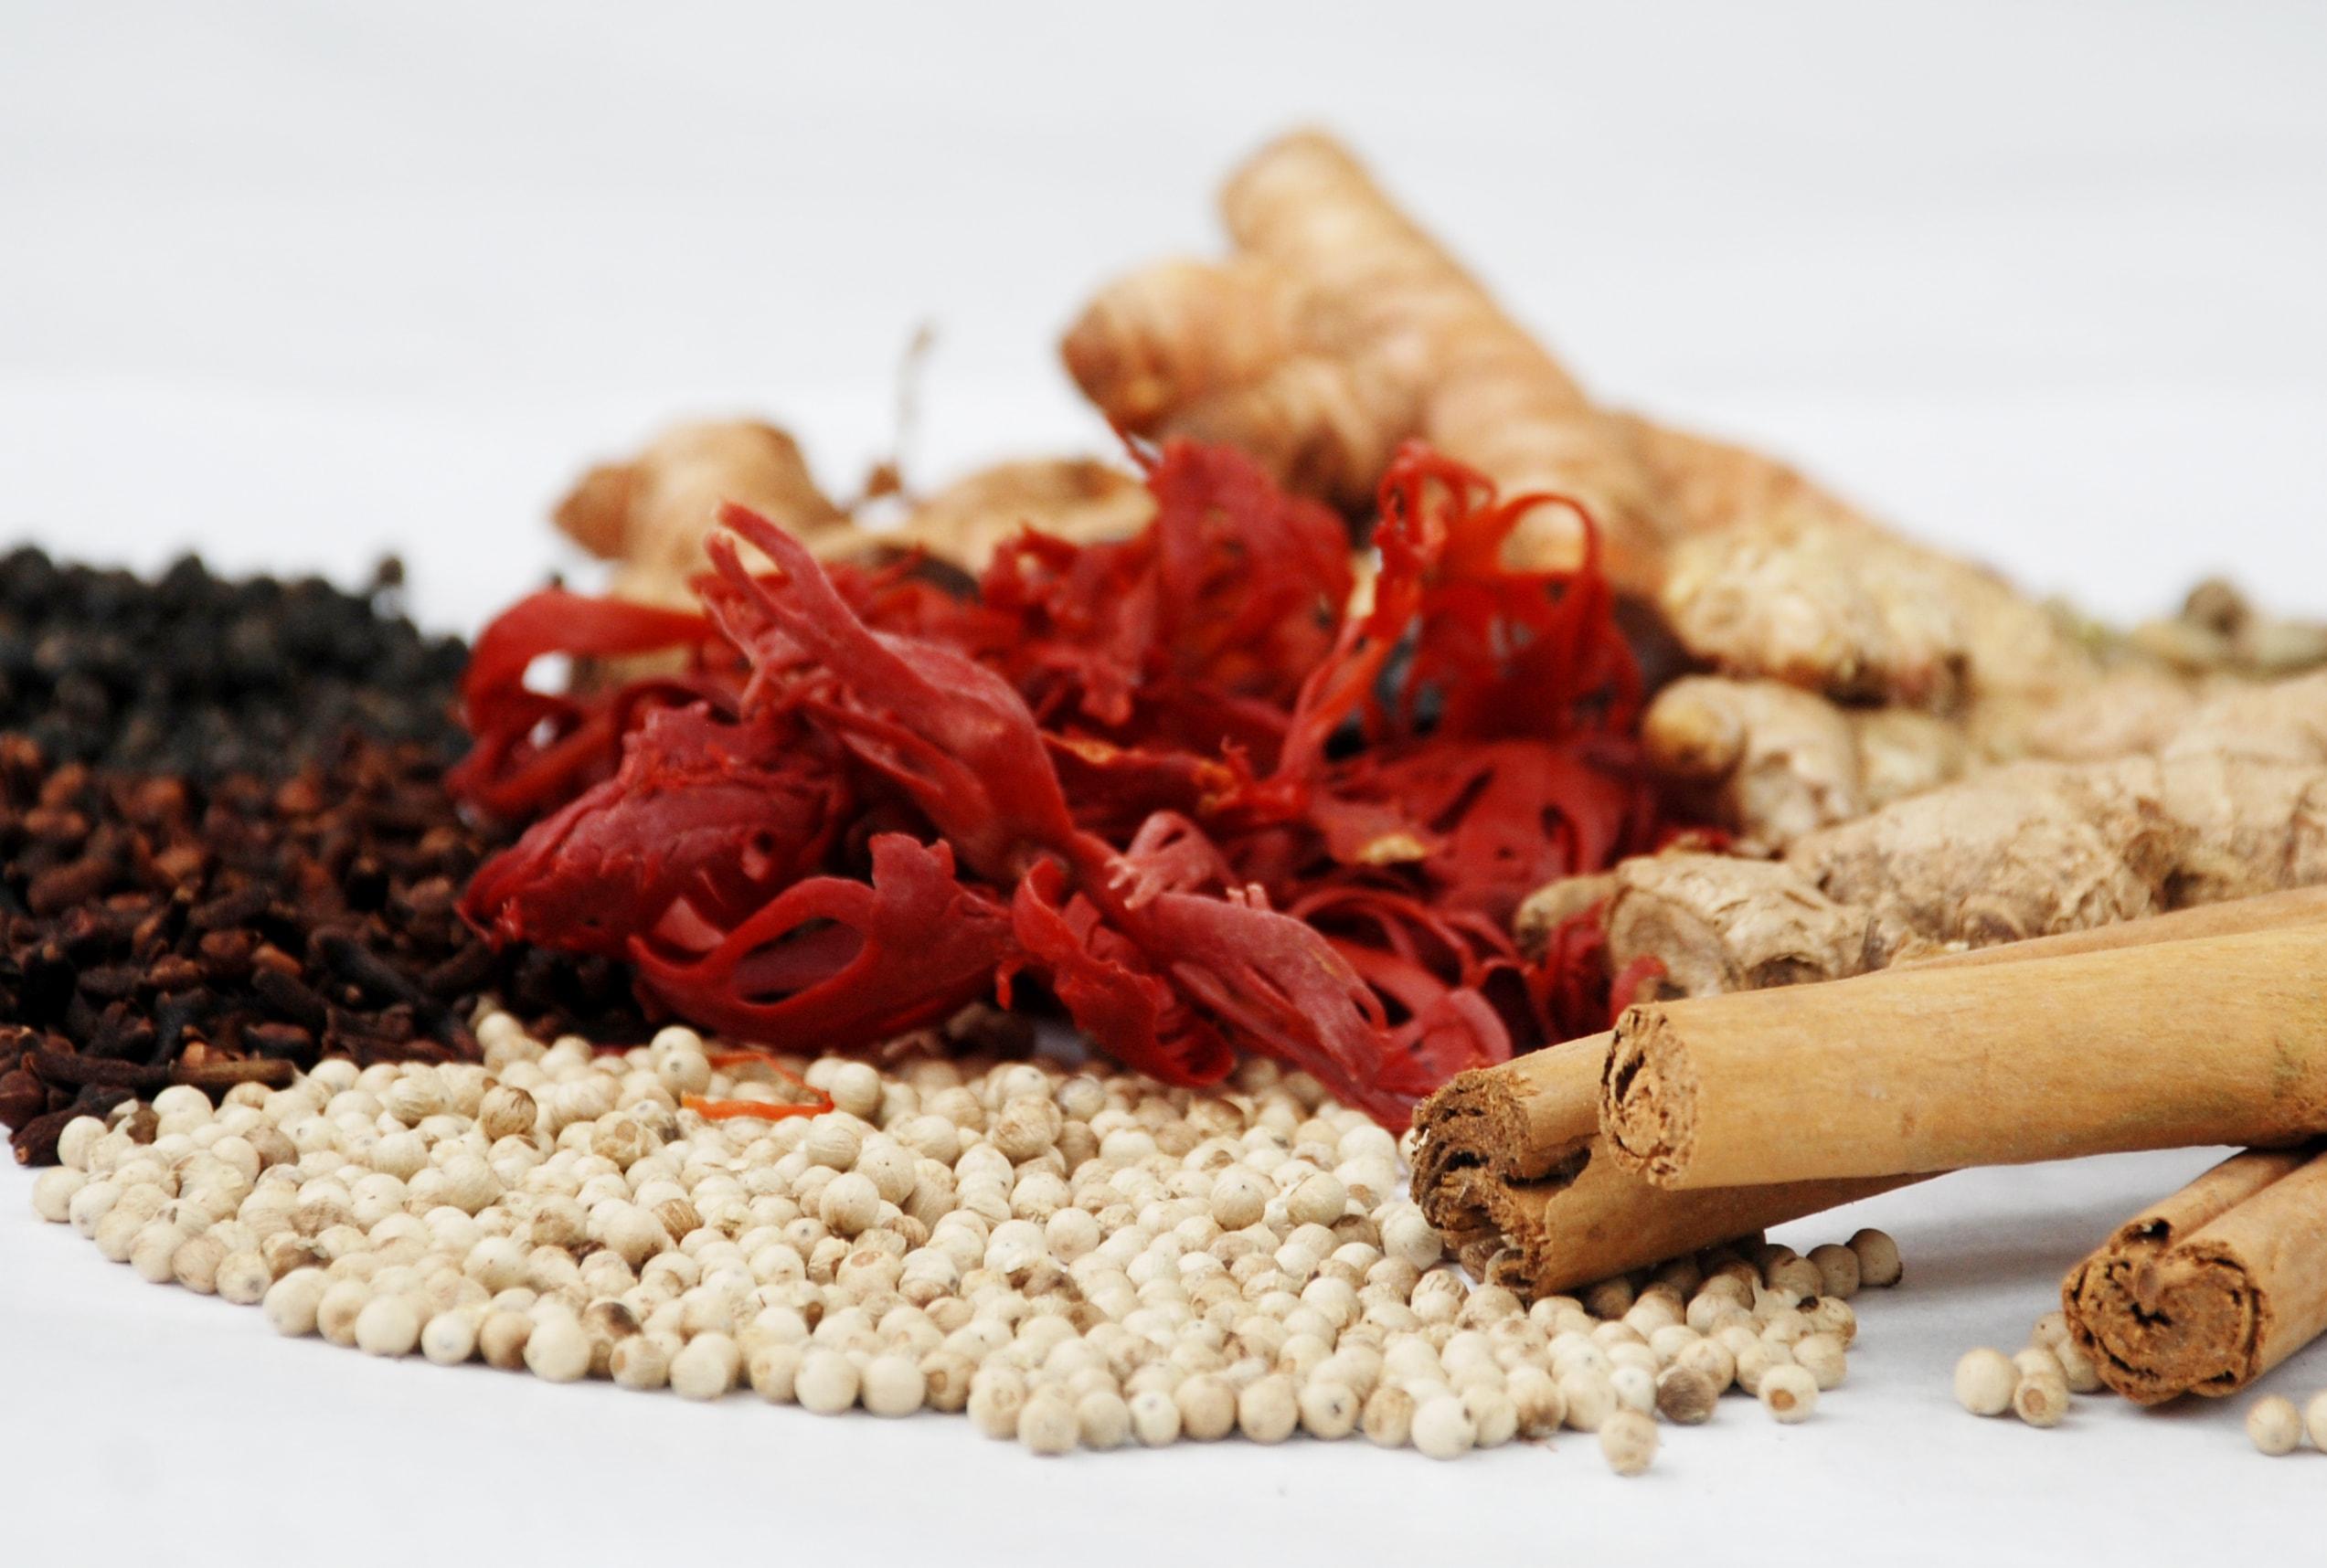 Acril Spice Island Spices